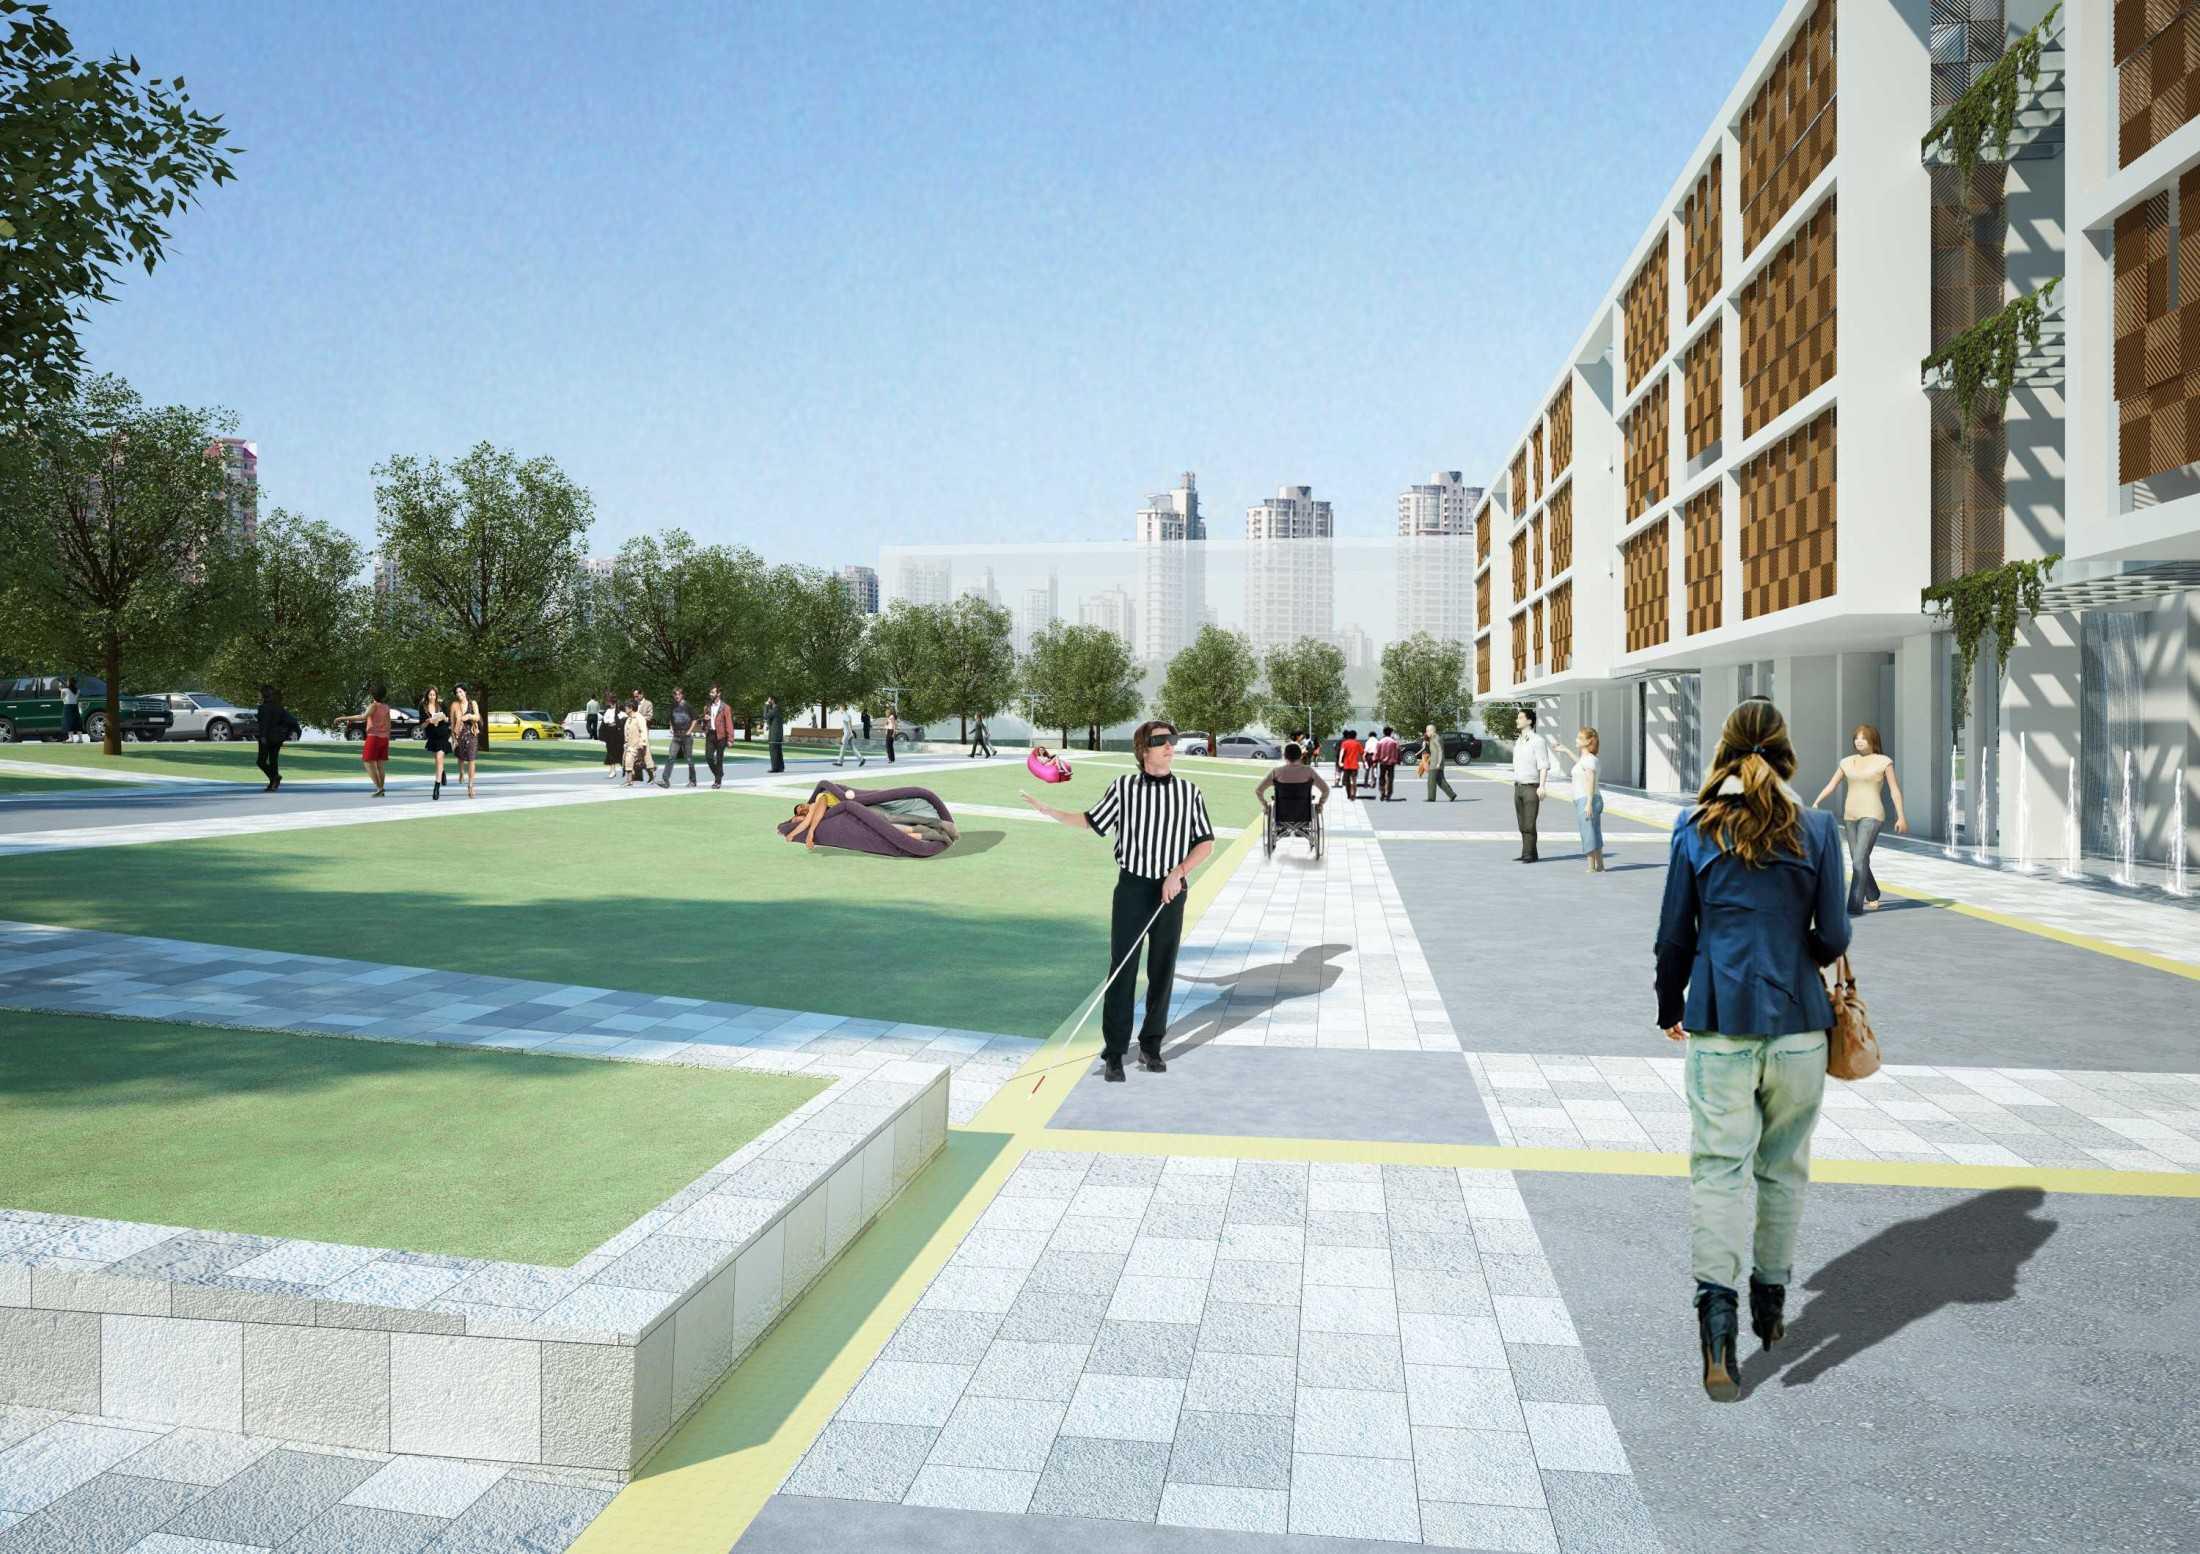 D4 C9 Housing Complex - Madrid Madrid, Spanyol Madrid, Spanyol D4-C9-Housing-Complex-Madrid  102347